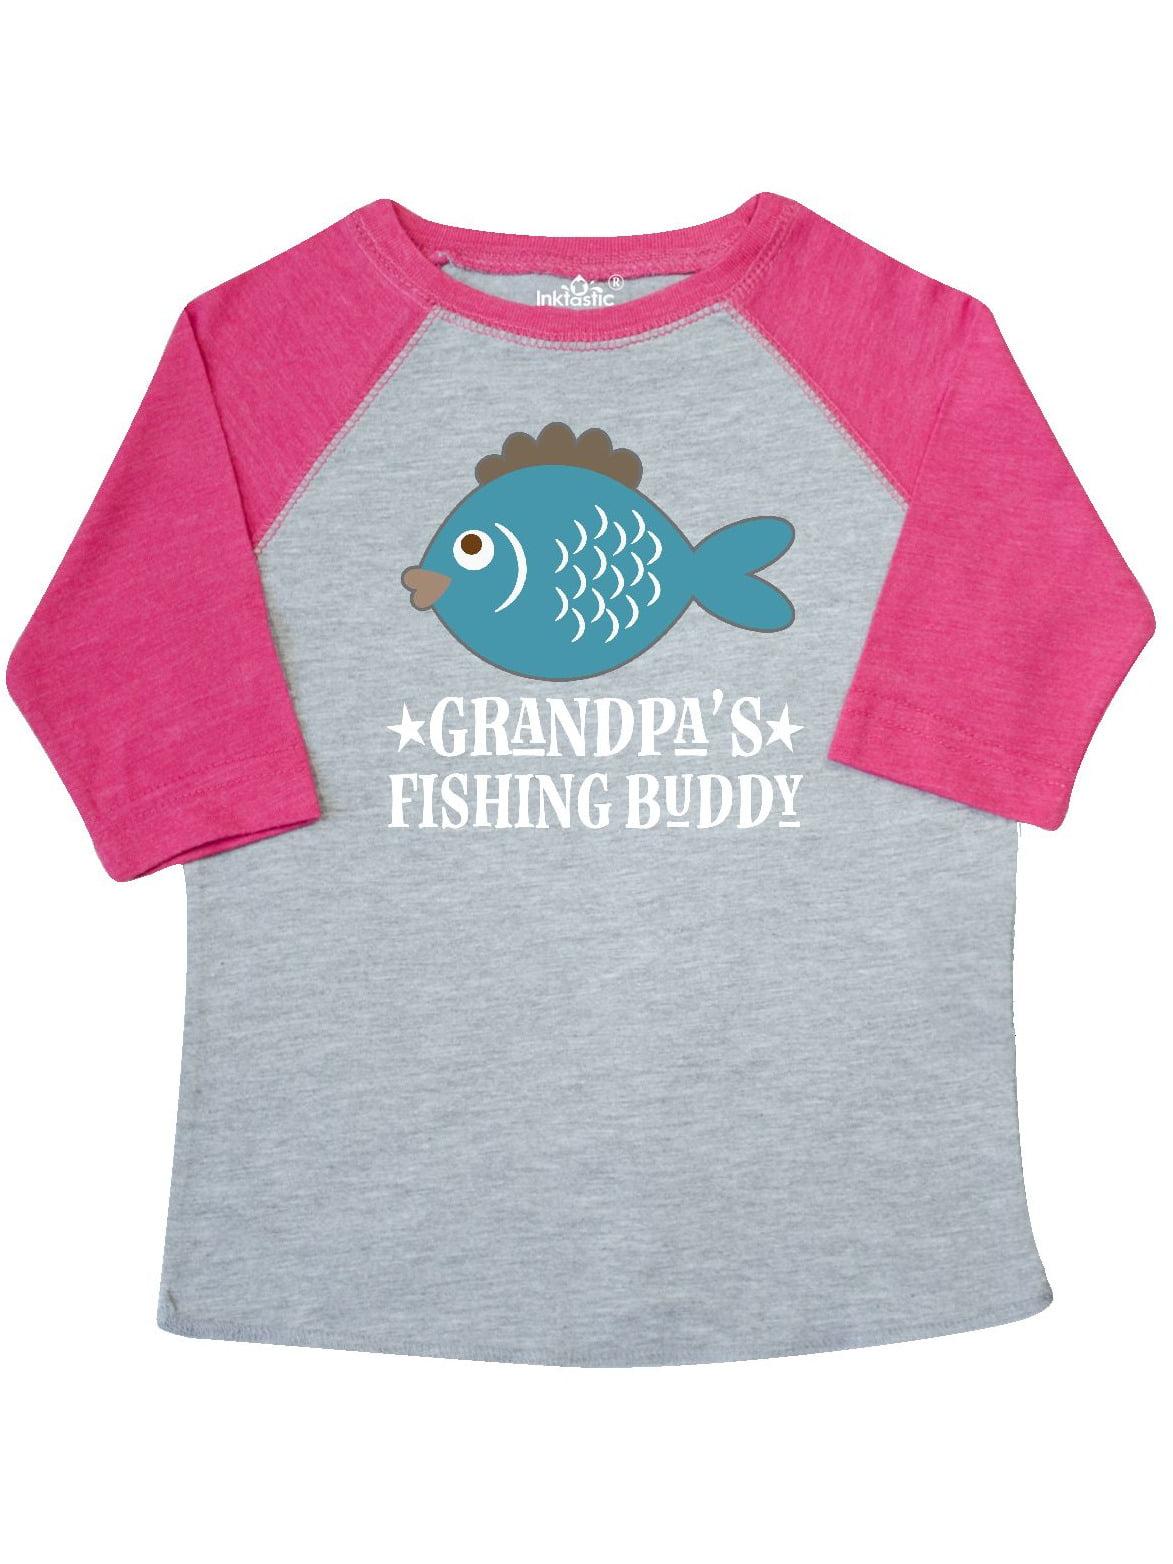 Grandpa's Fishing Buddy Little Fisher Toddler T-Shirt